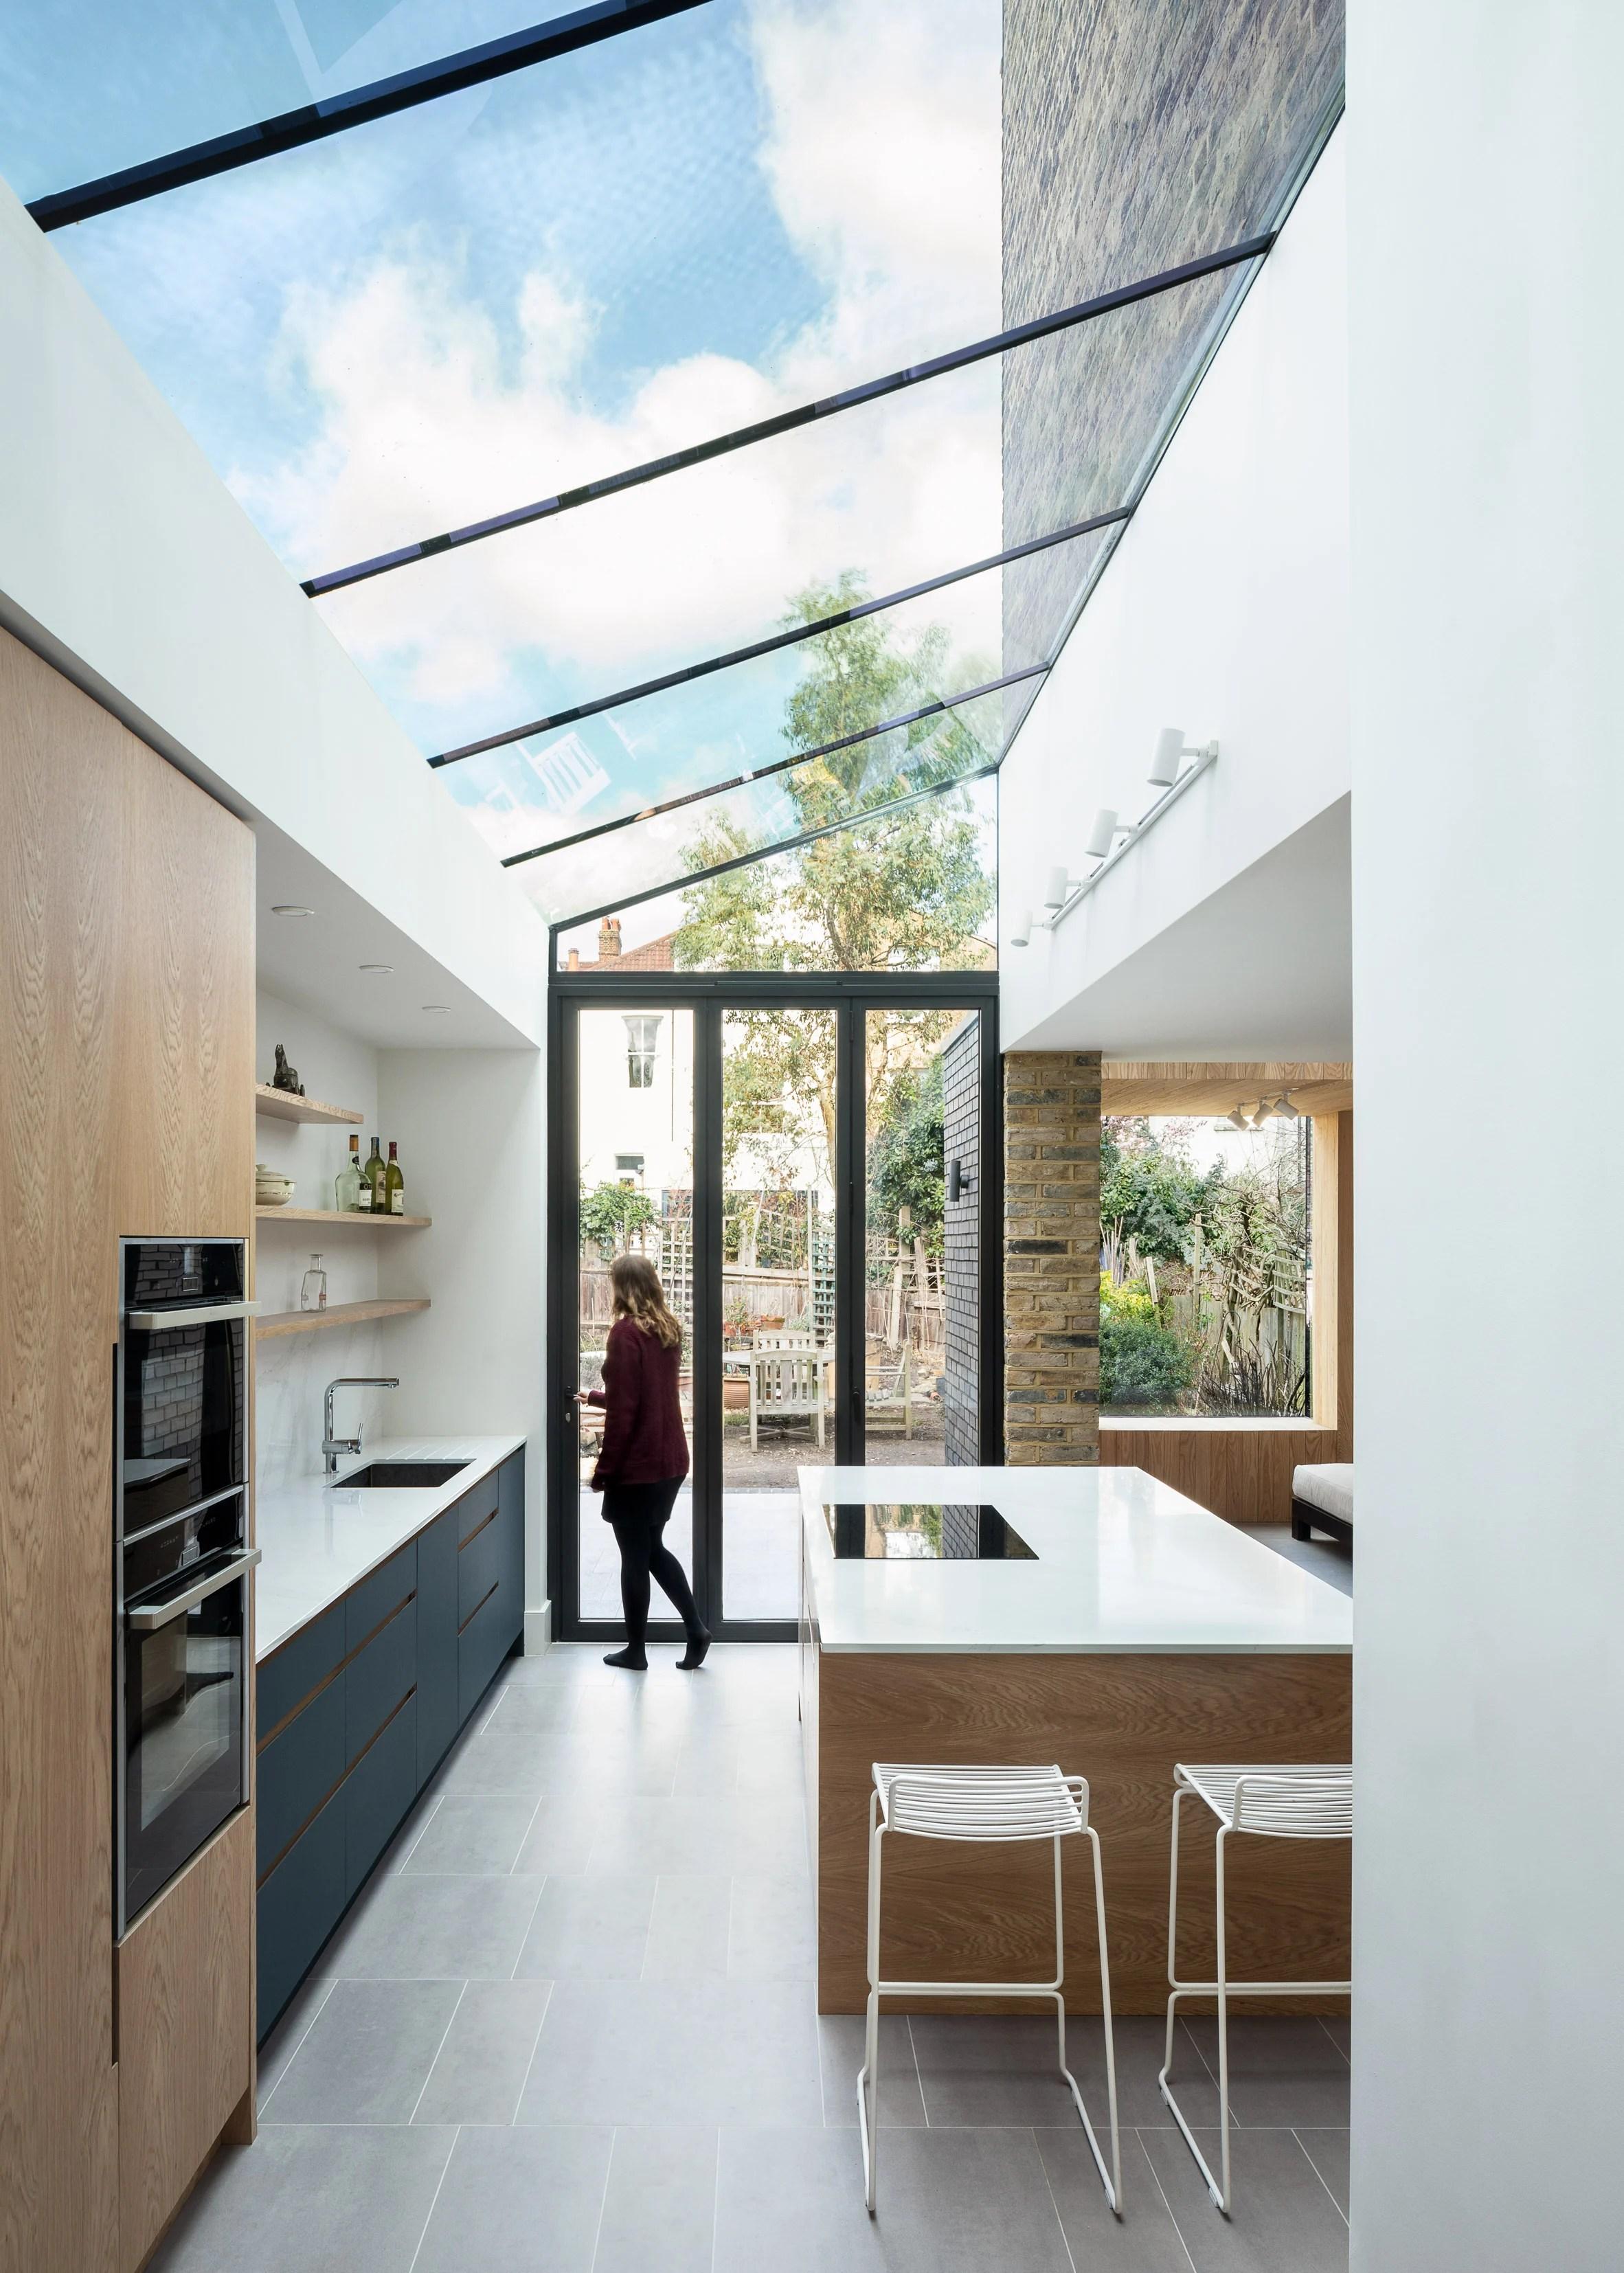 Snug House by Proctor & Shaw